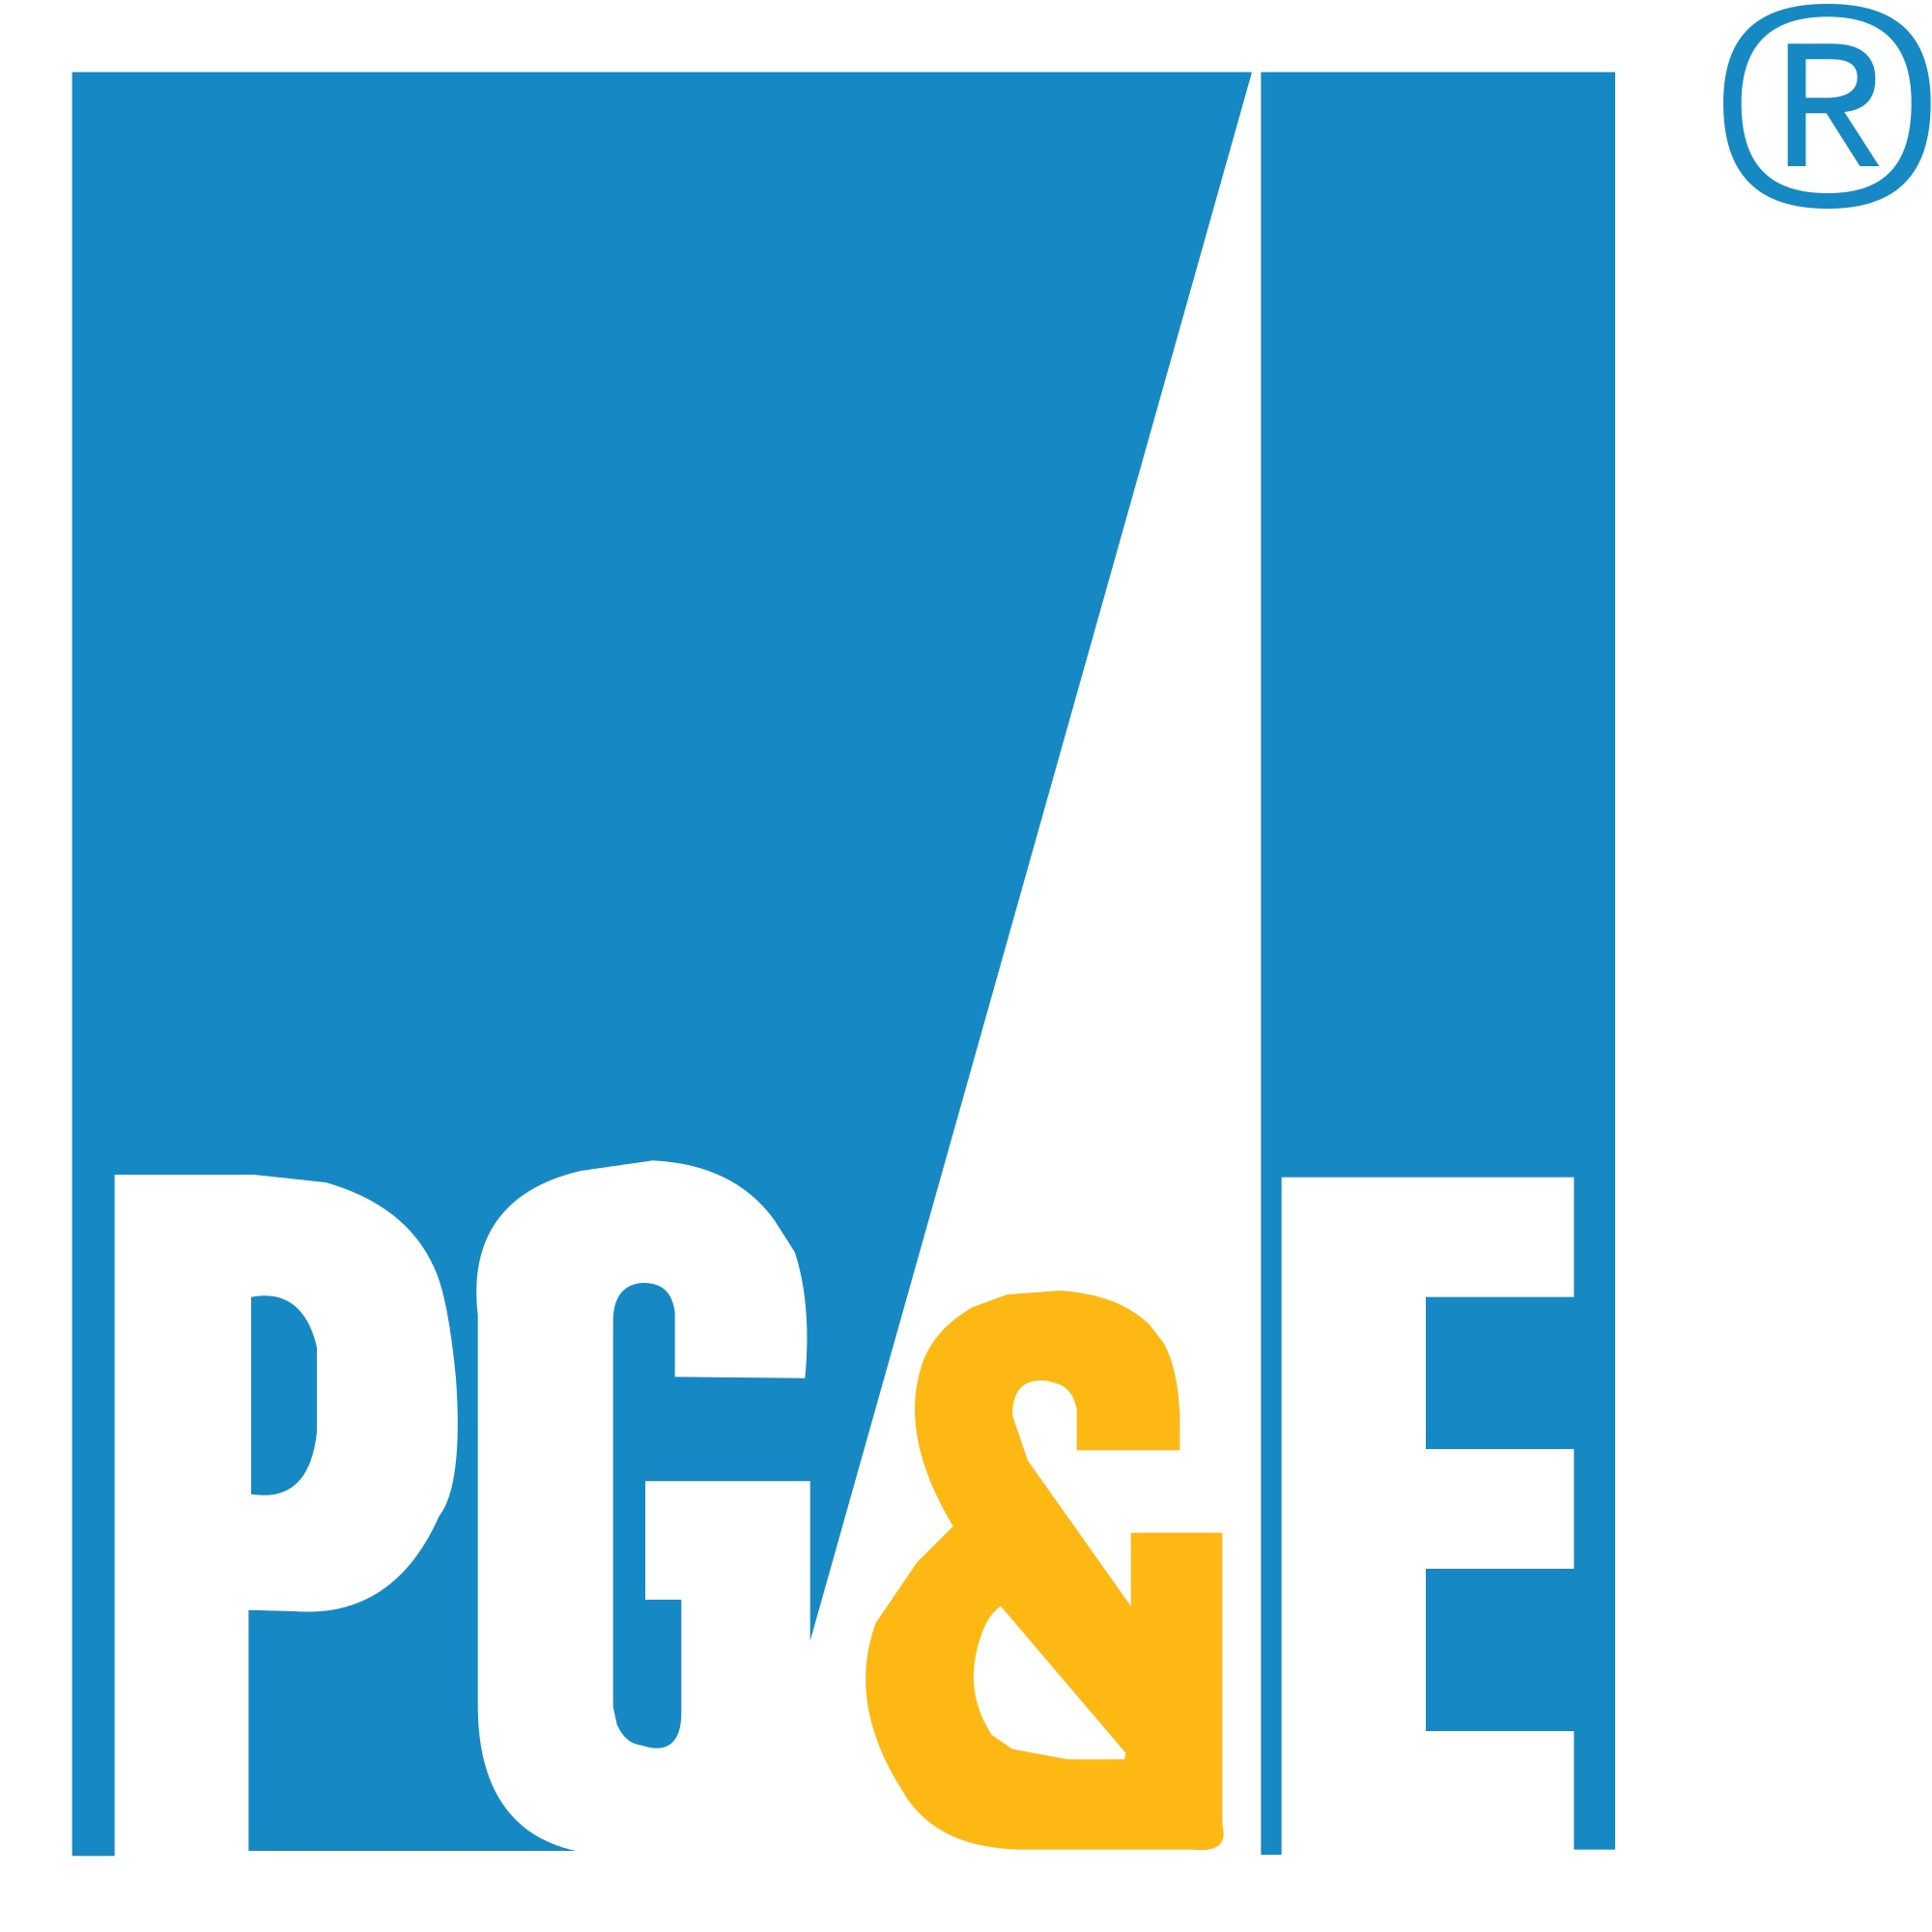 pge_logo.jpg